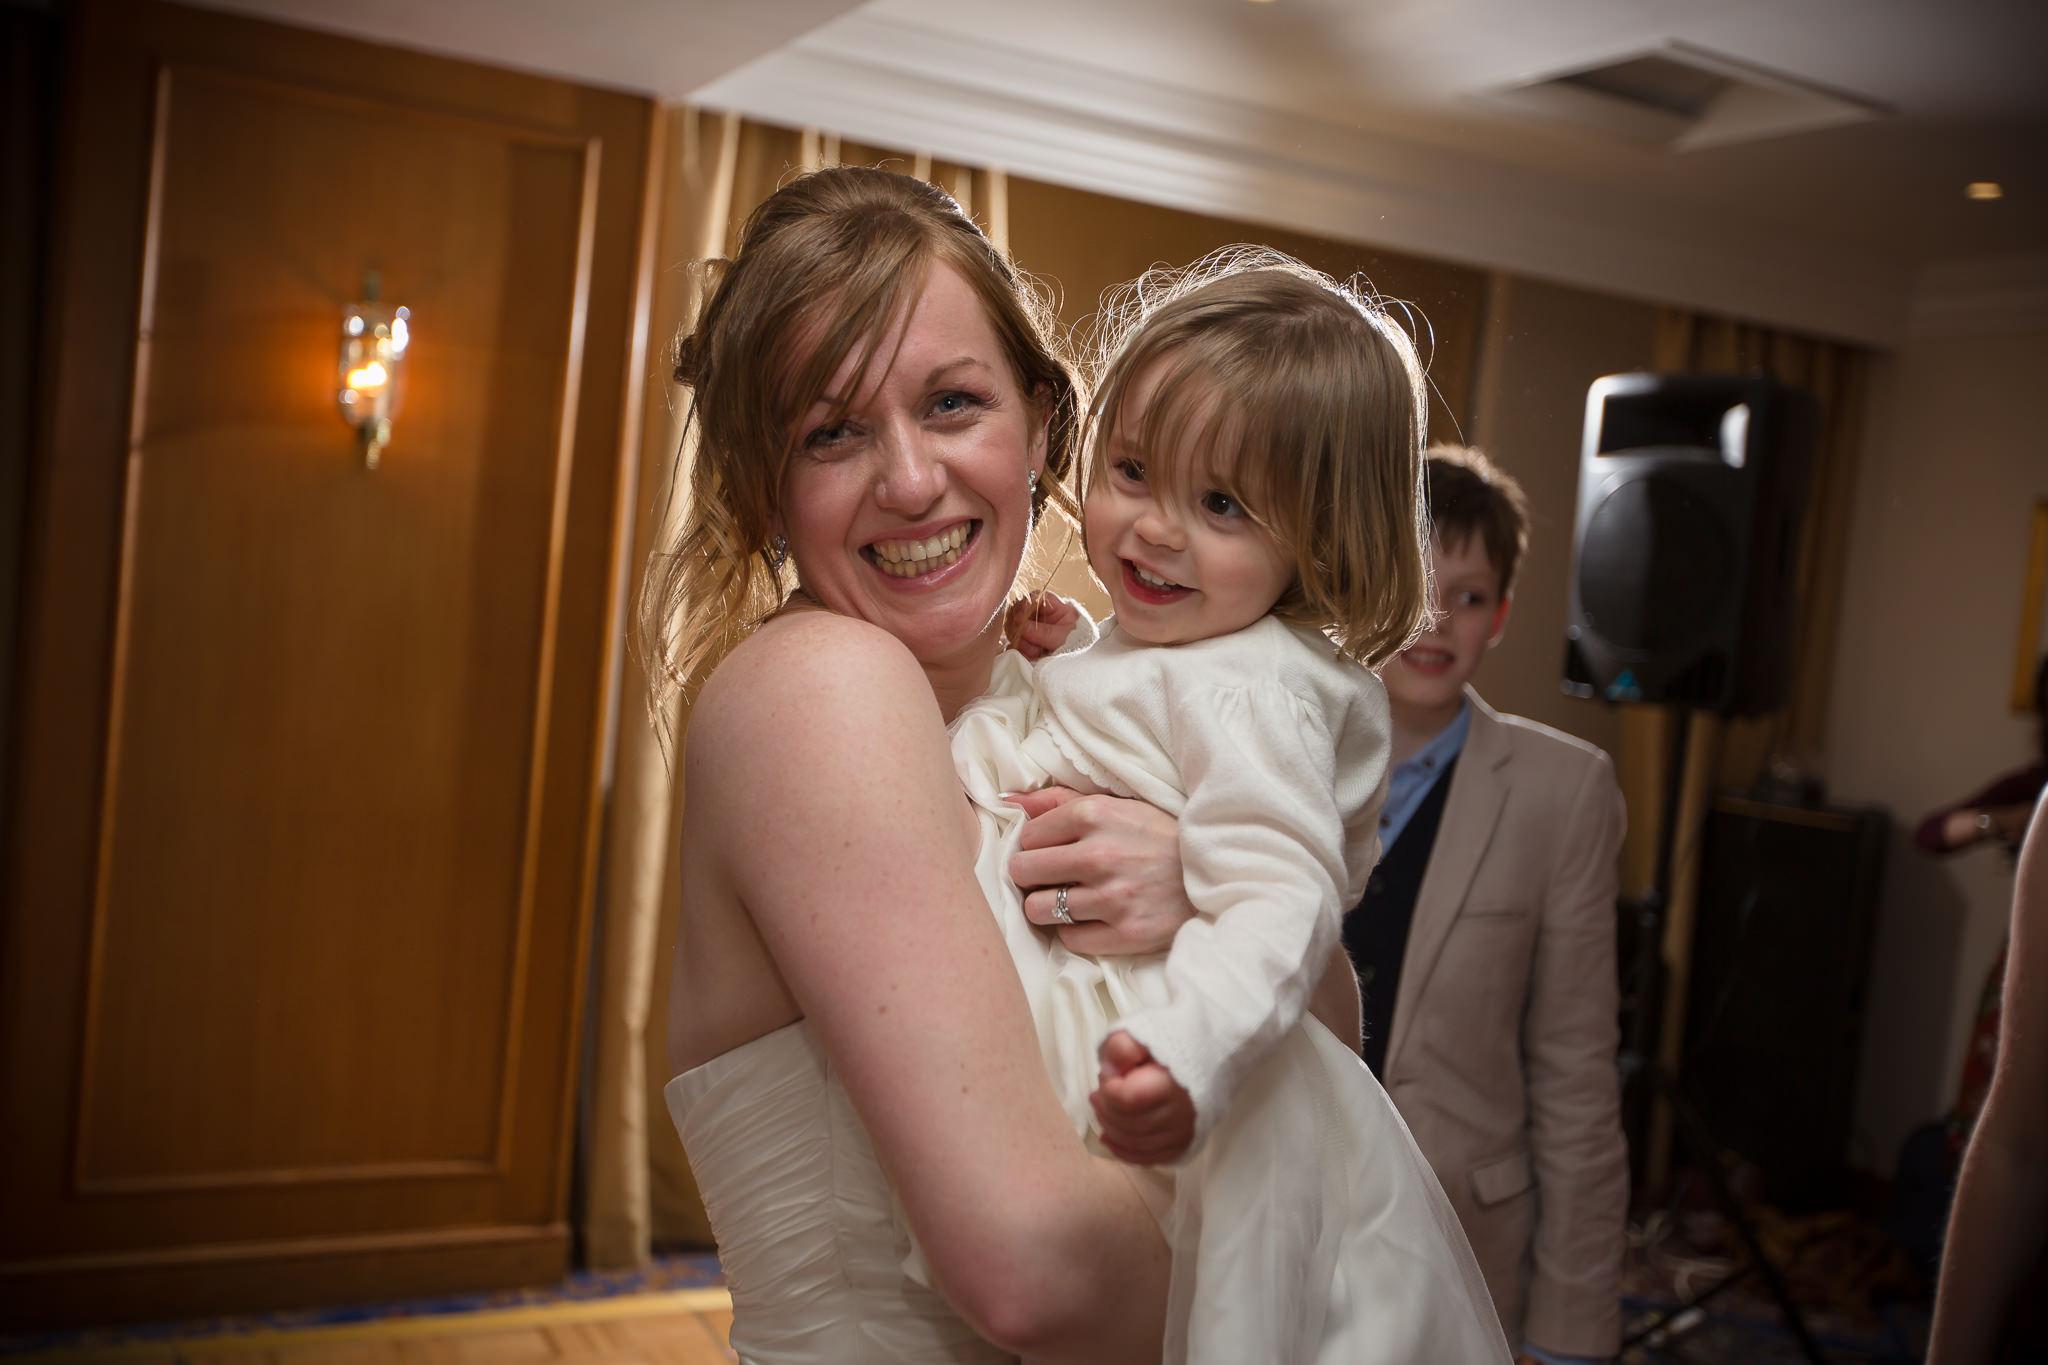 Billesley-Manor-Wedding-Photography-Great-Photographer